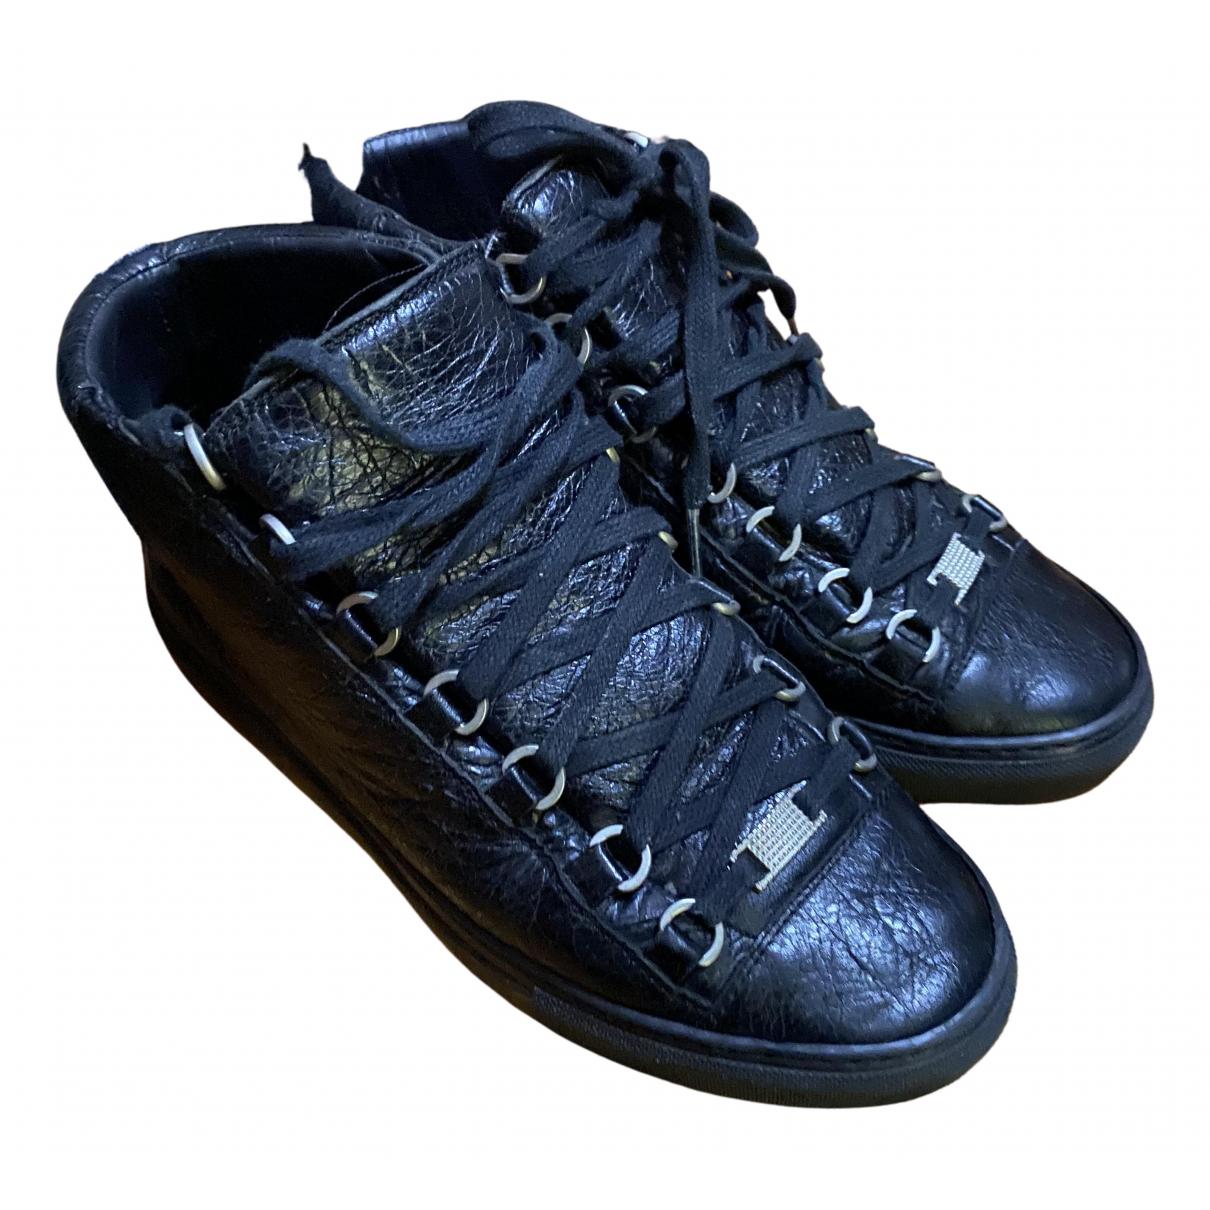 Balenciaga Arena Black Patent leather Trainers for Men 41 EU